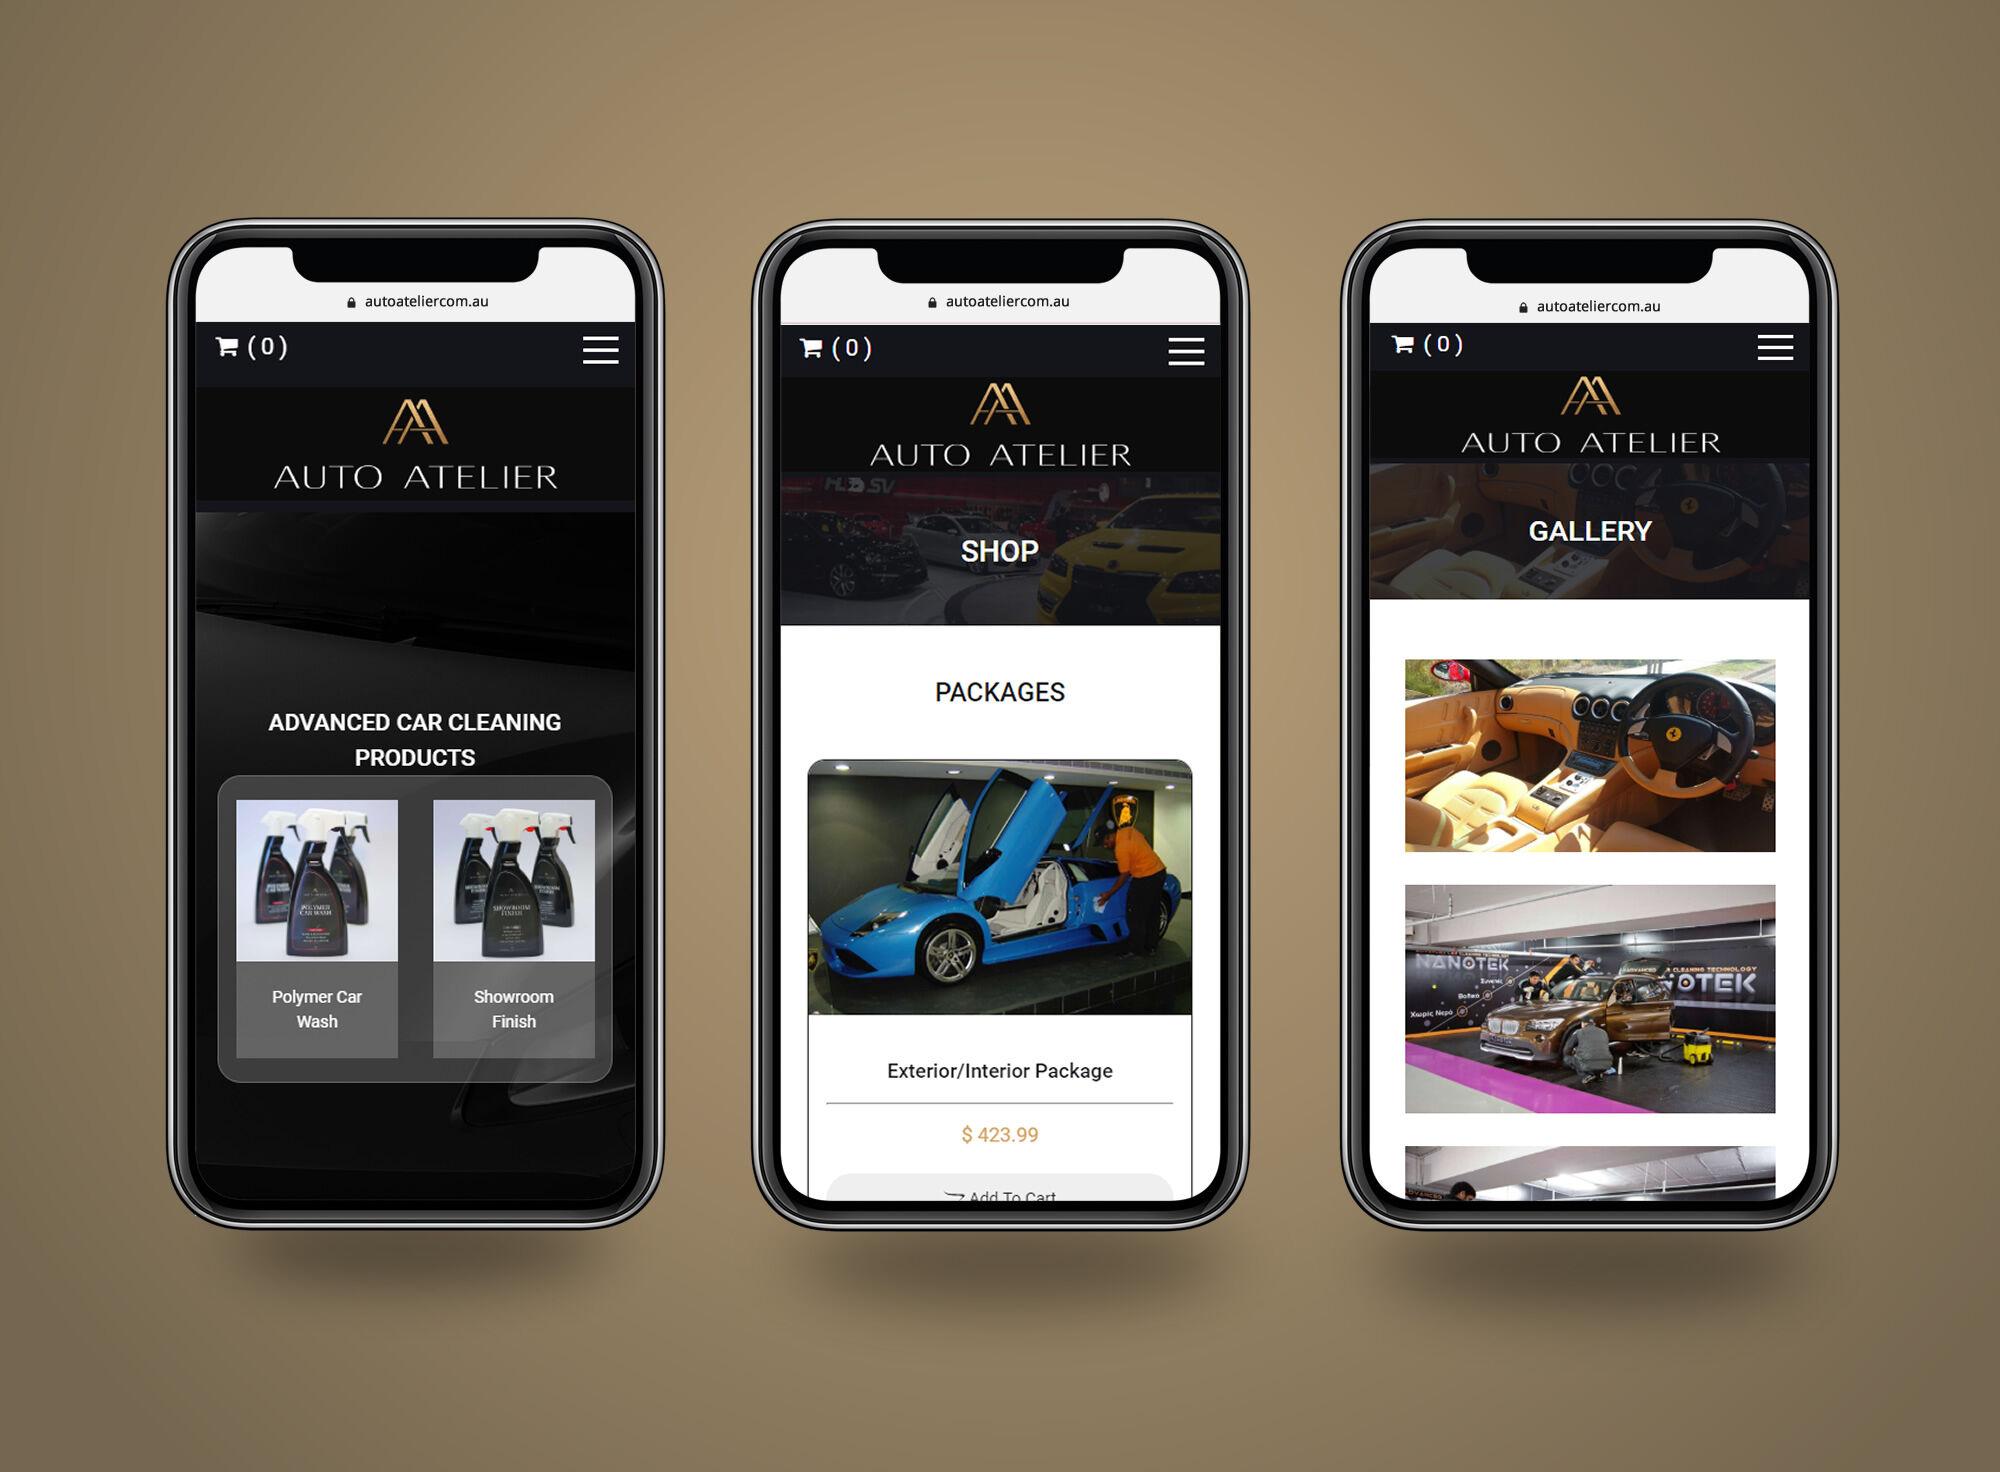 Auto Atelier mobile view